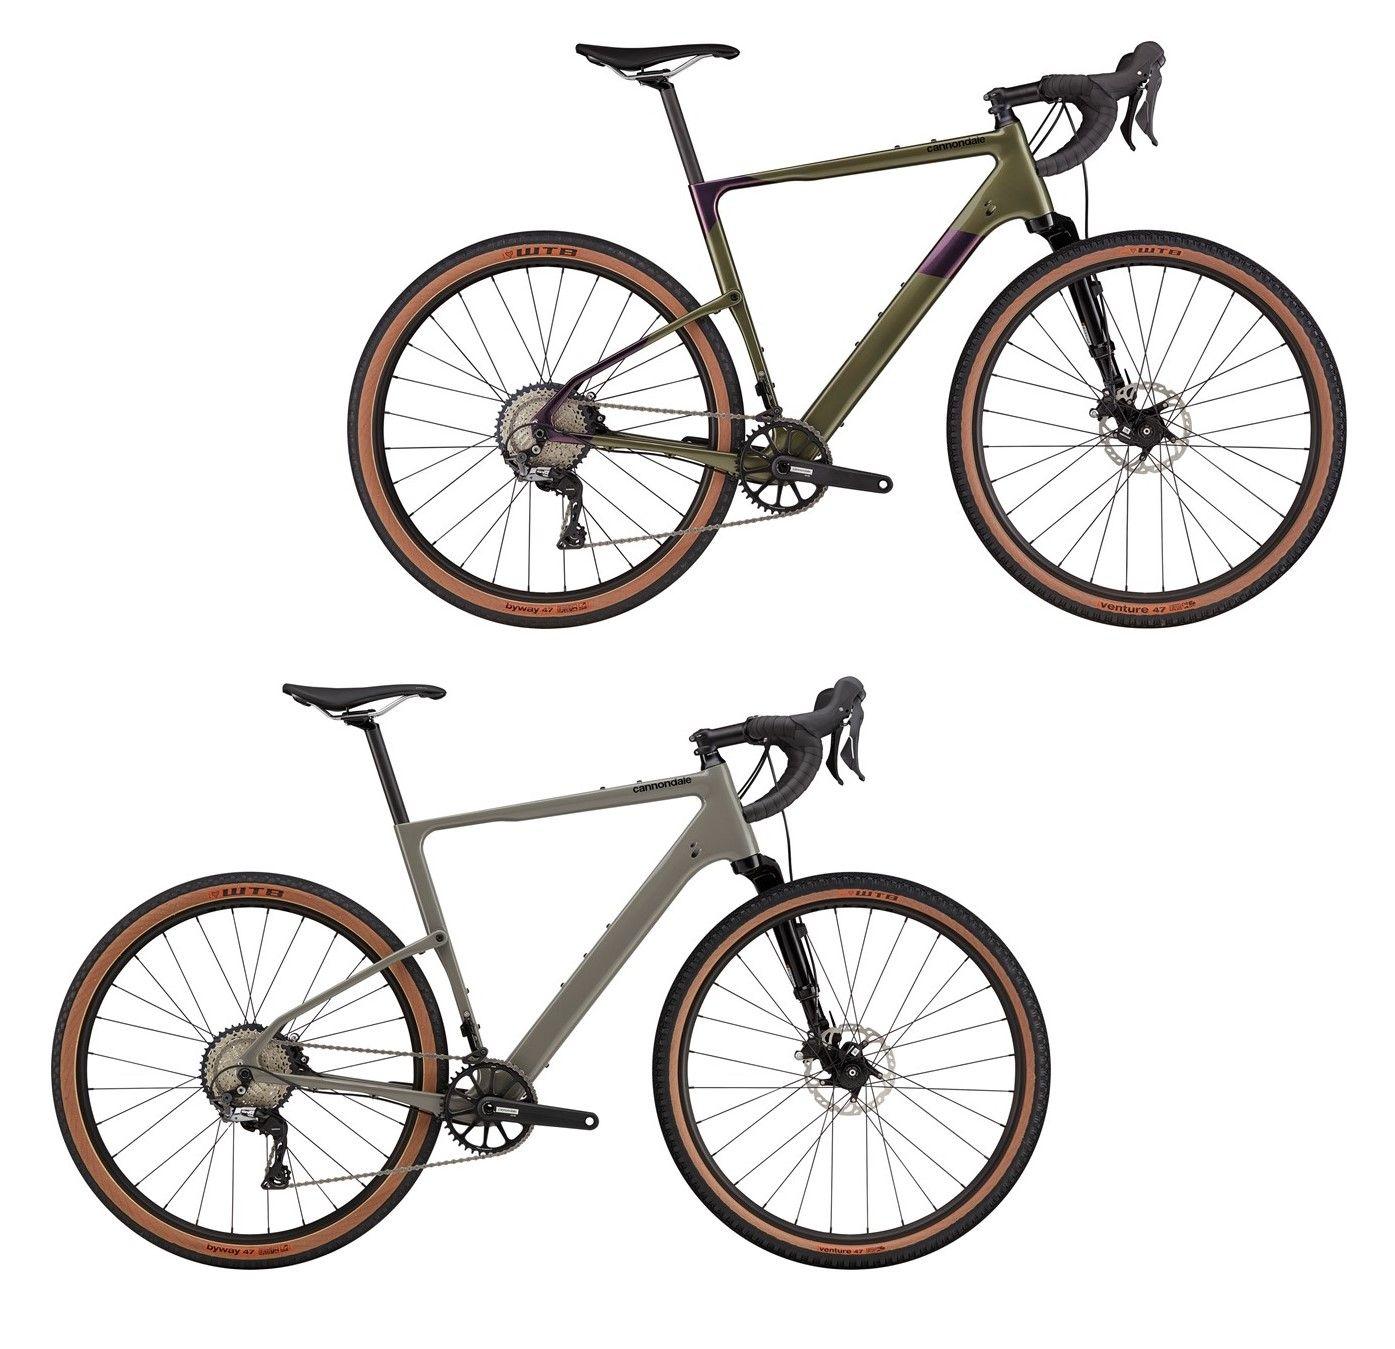 Cannondale Topstone Carbon Lefty 3 650b Gravel Bike 2021   cross bike